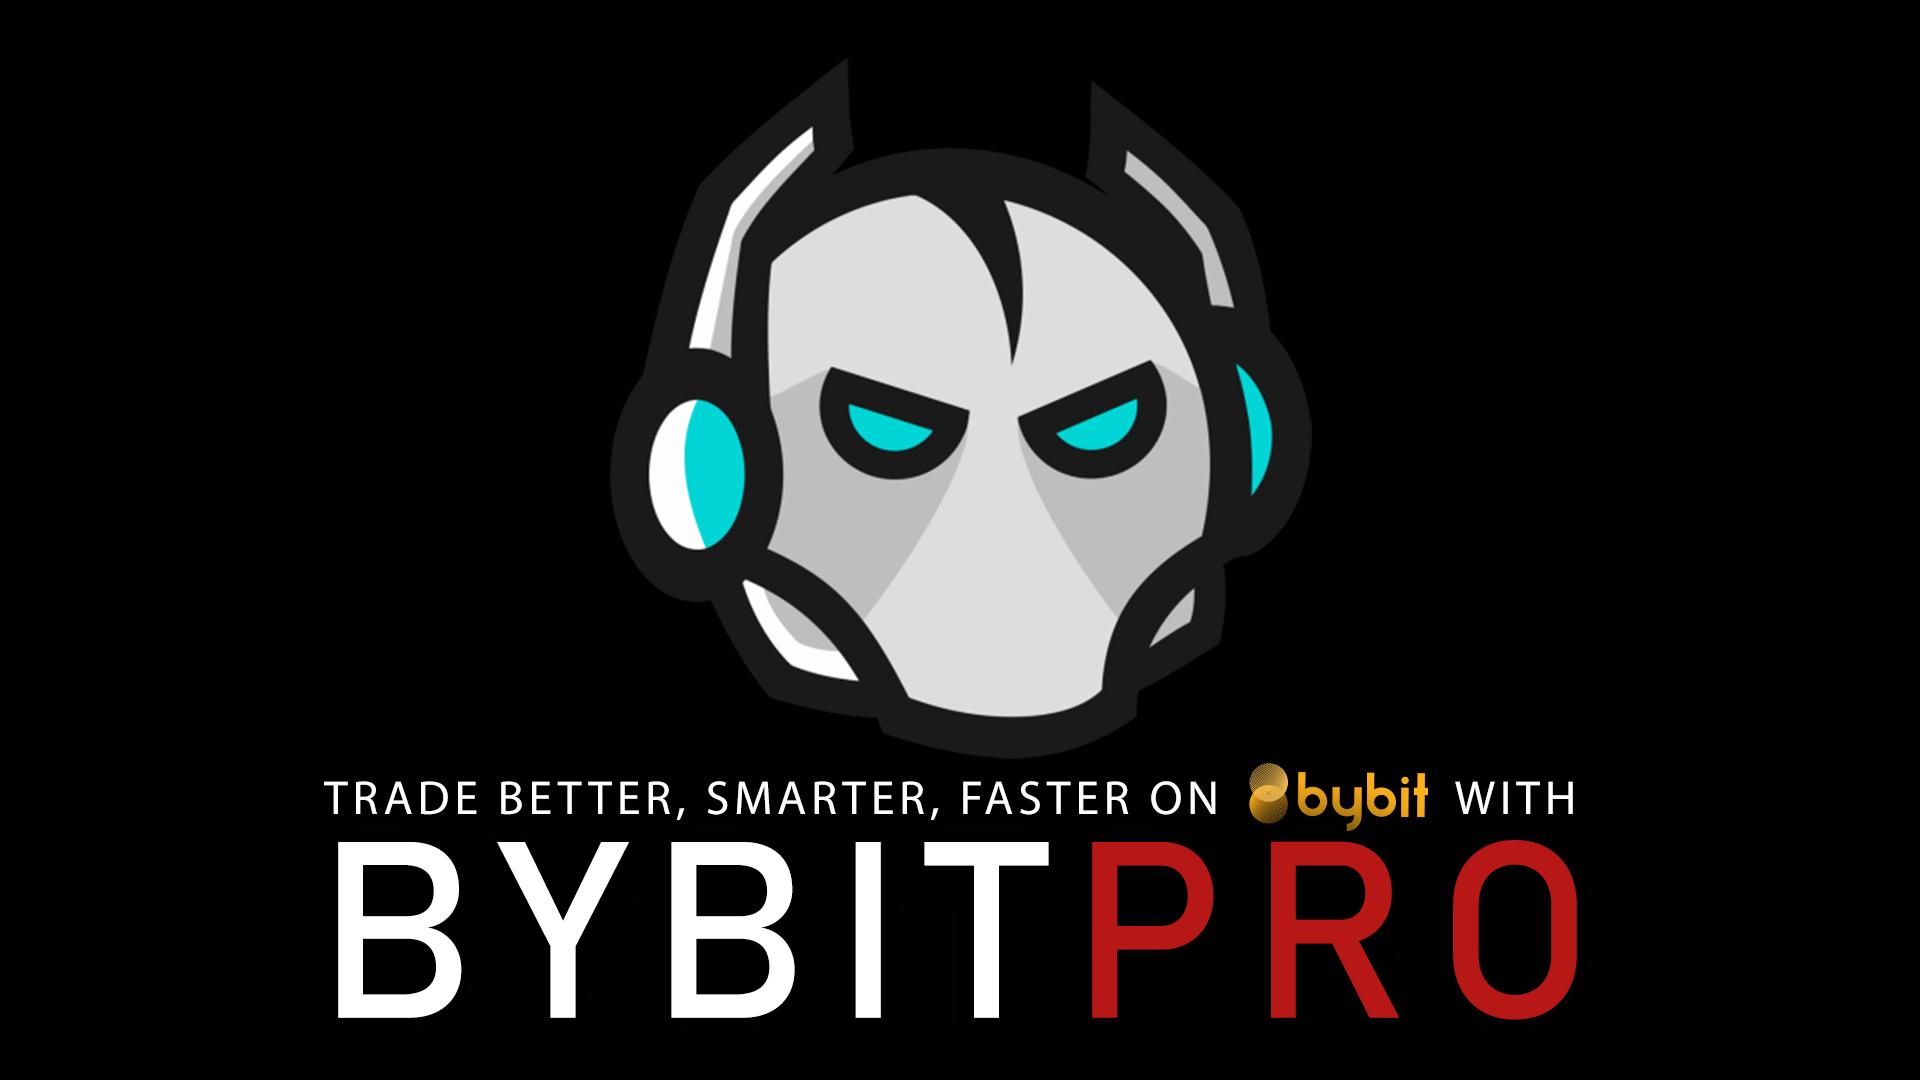 Bybitpro